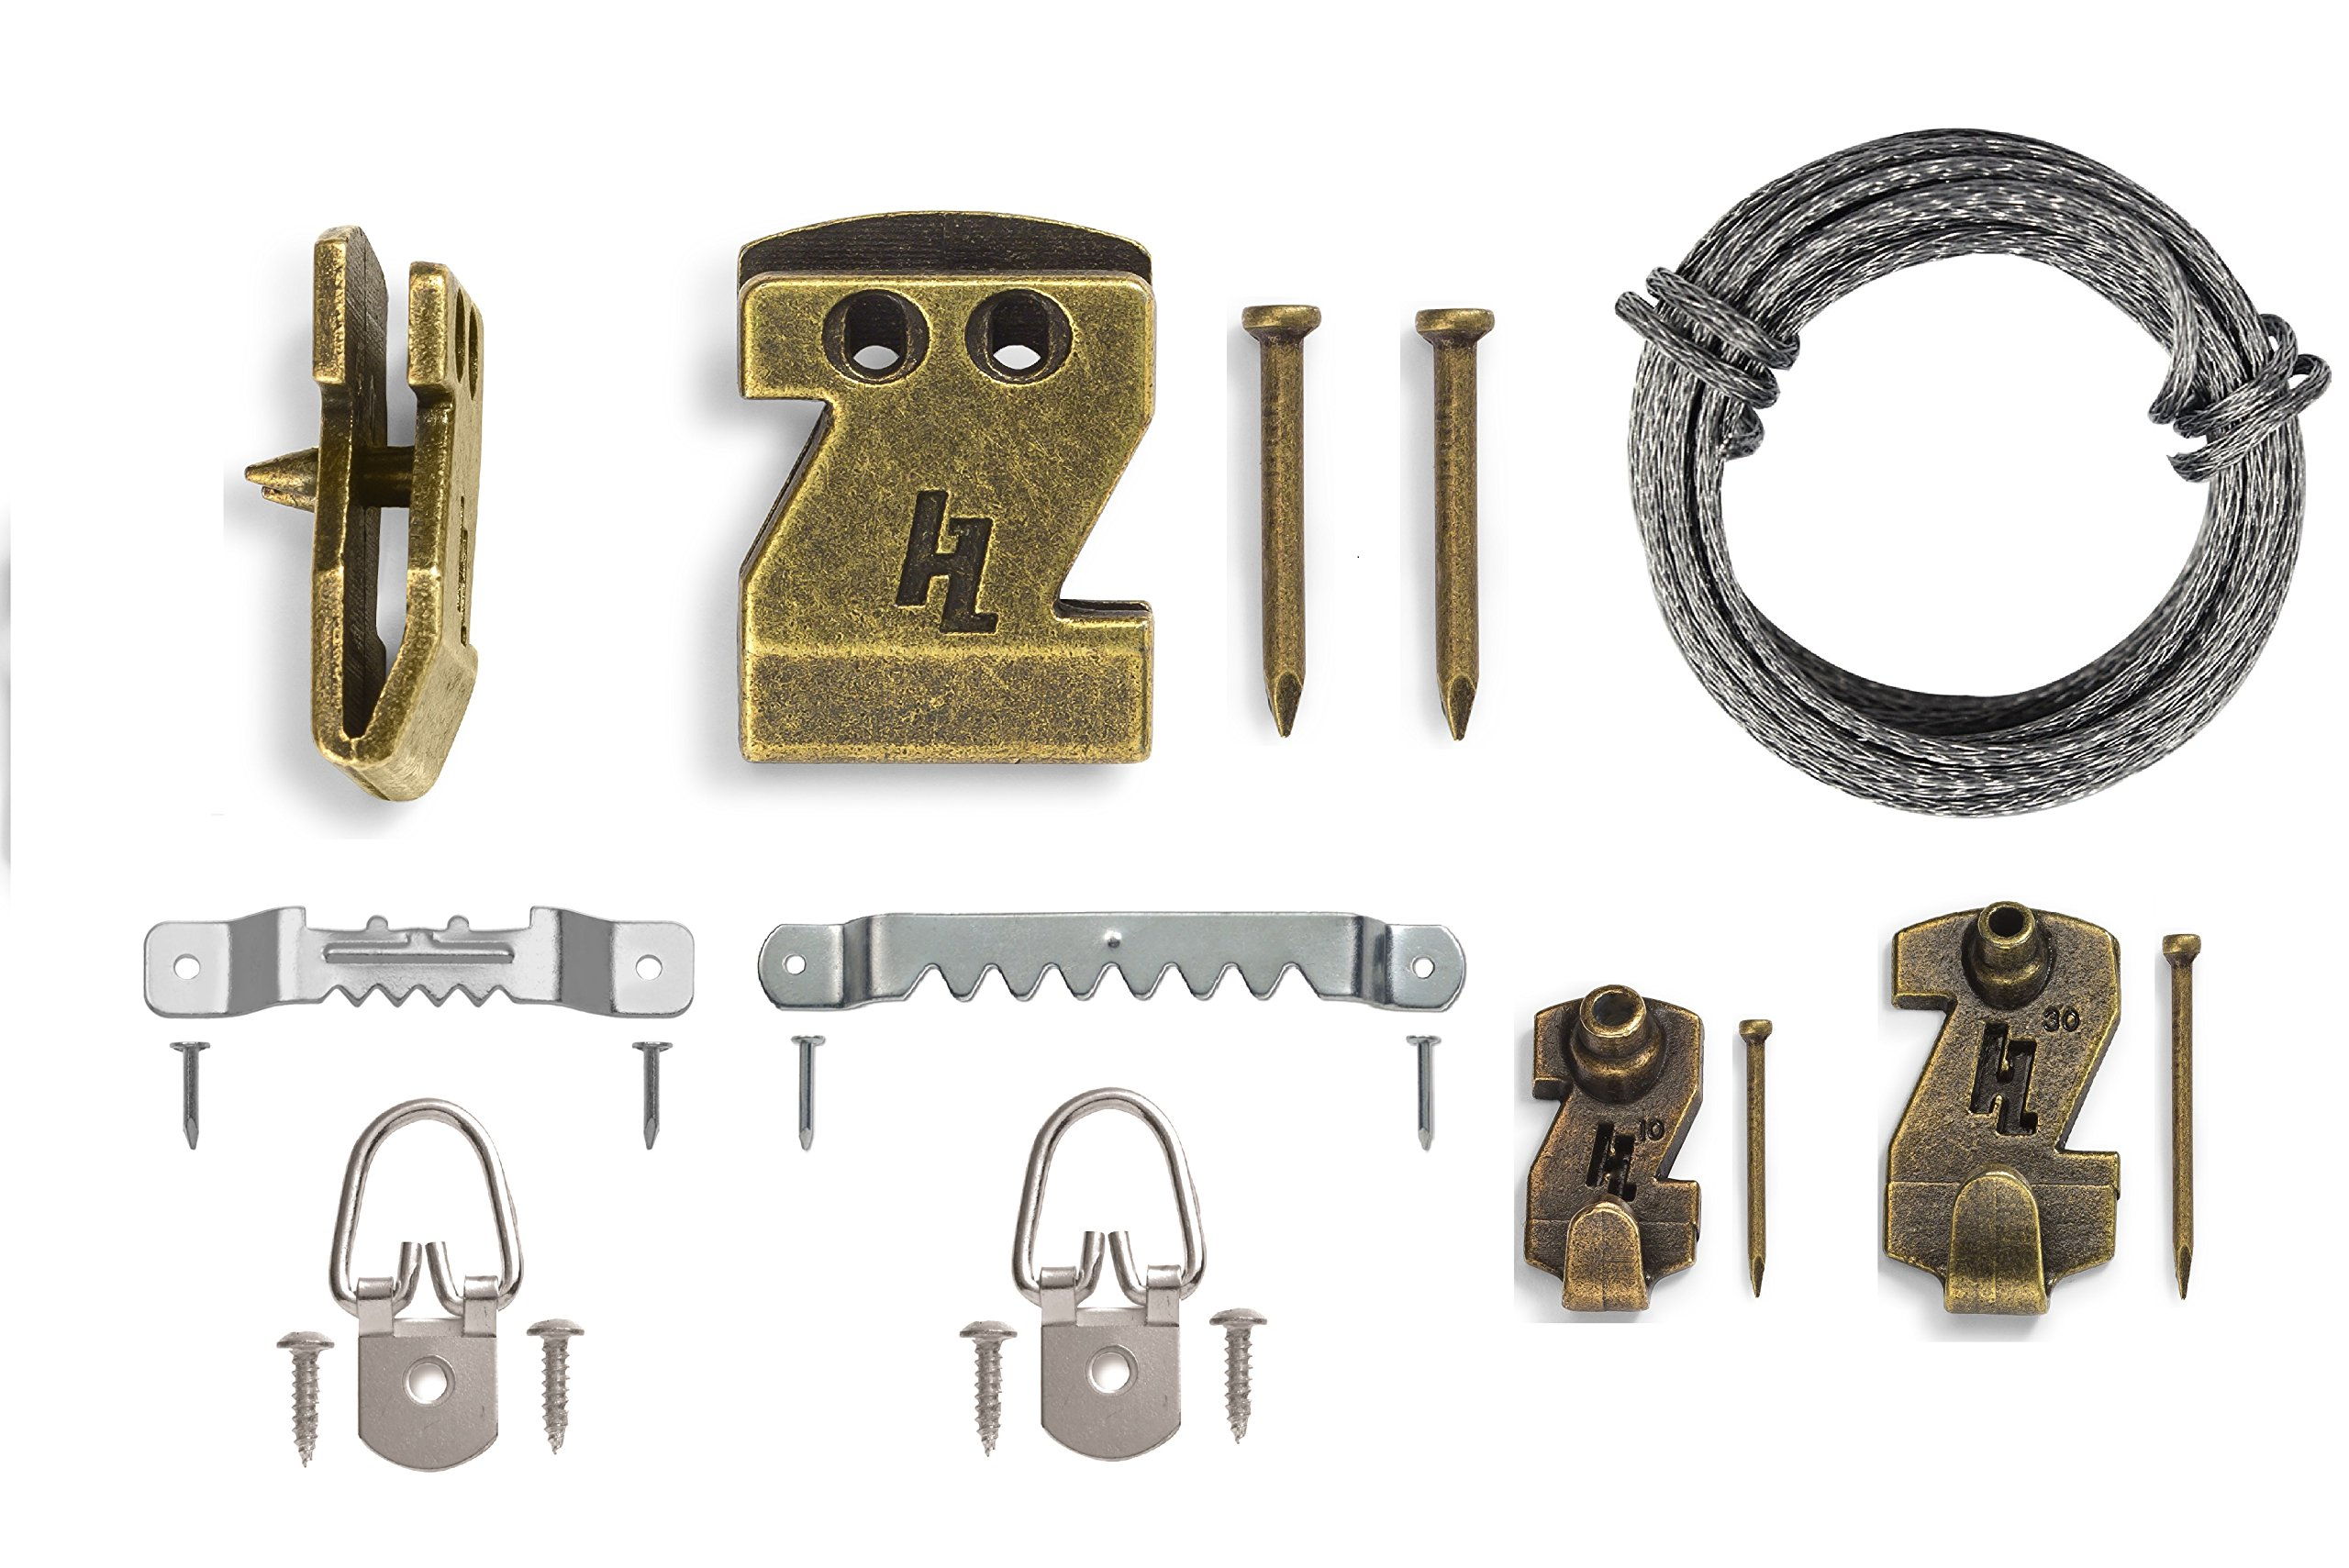 HangZ 11103 Professional Picture Hanging Kit, 10lb-30lb